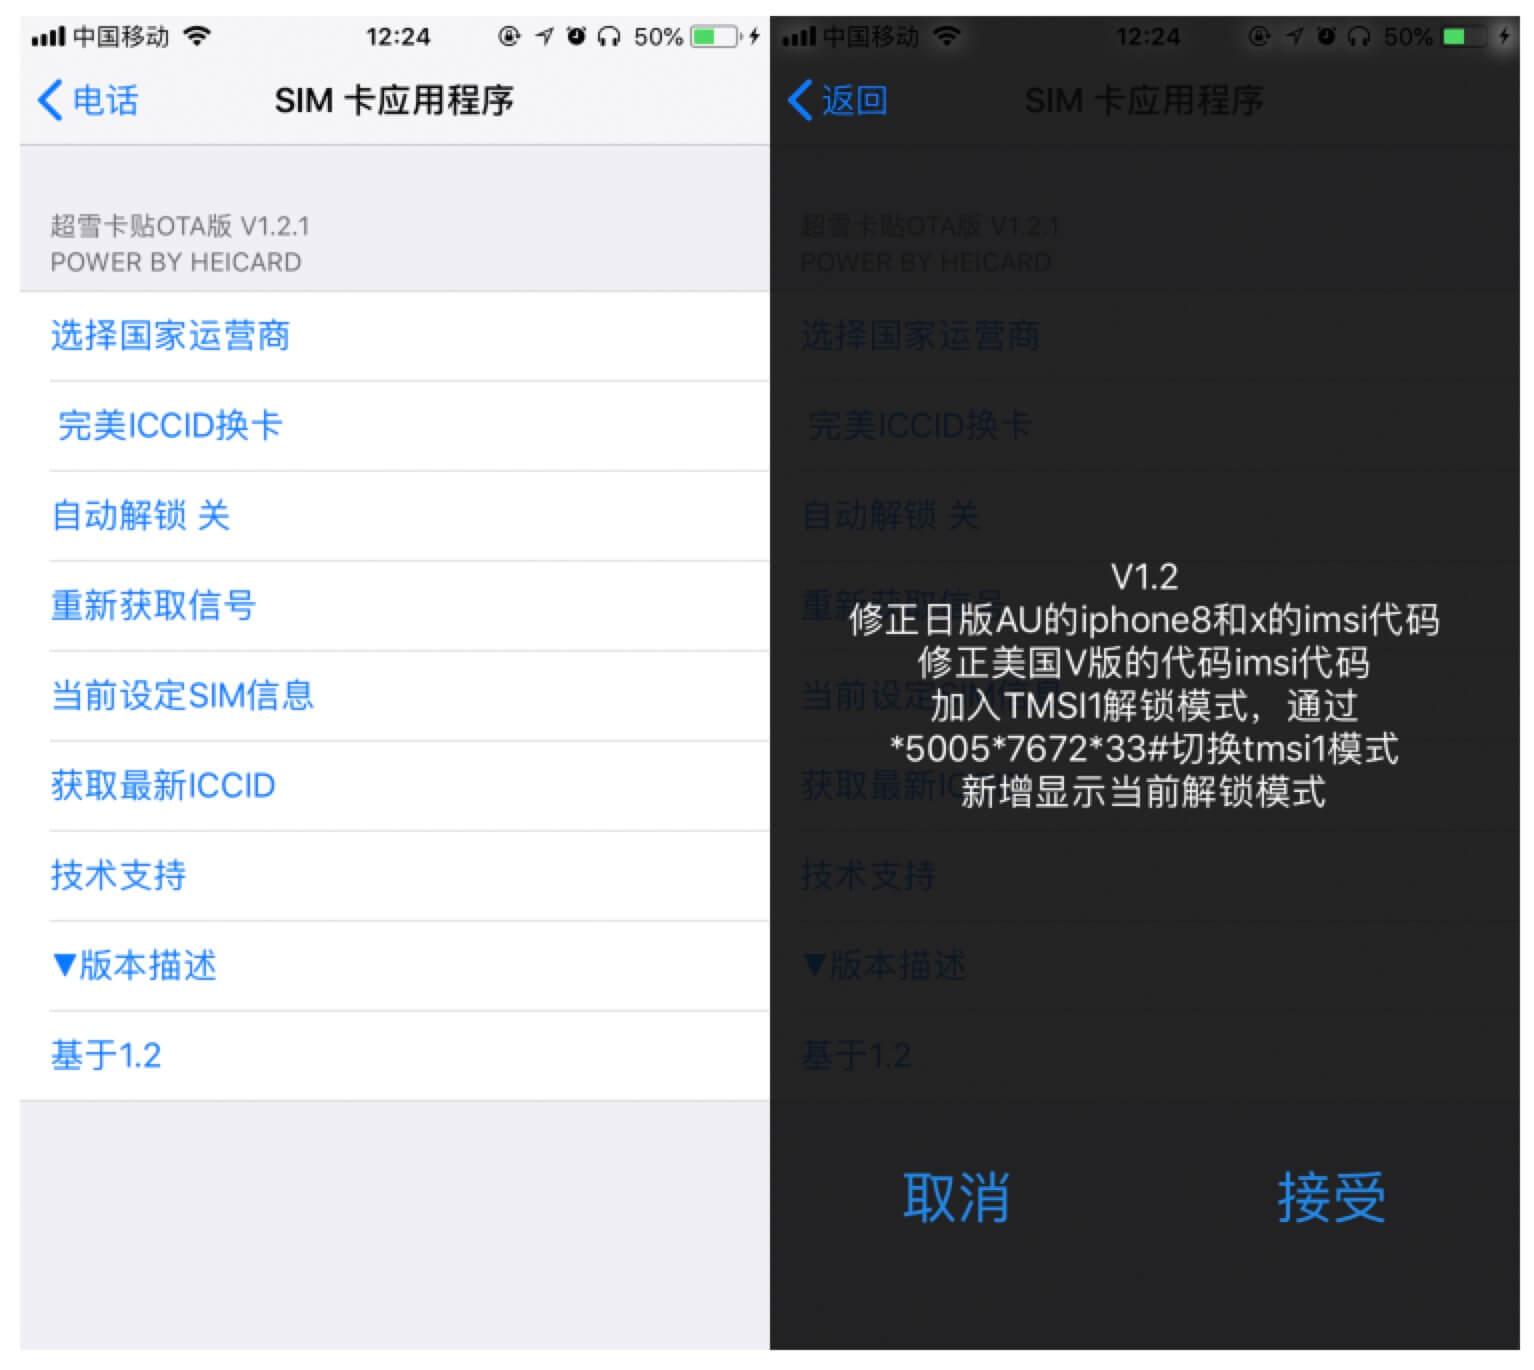 sim_menu_zn.jpg